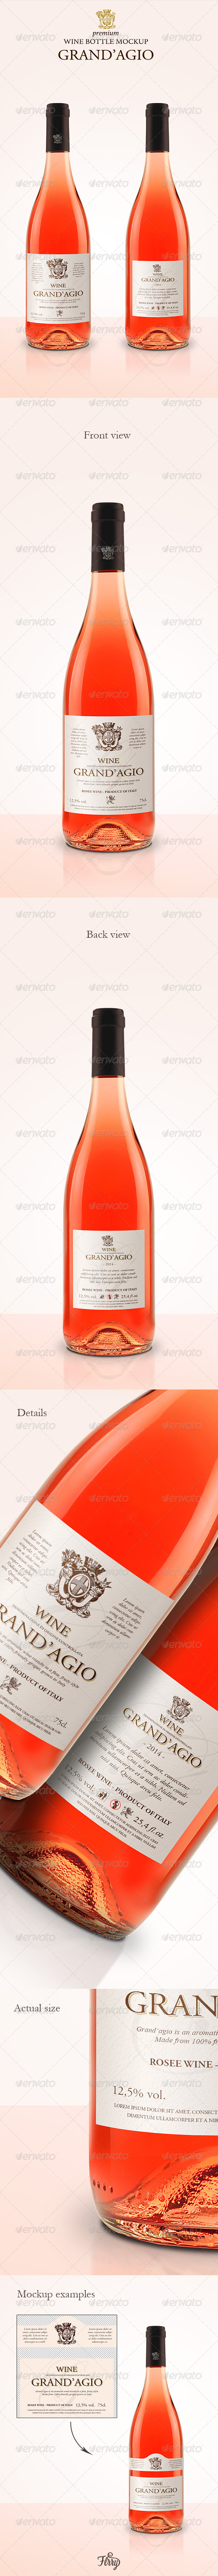 GraphicRiver Premium Rose Wine Mockup 7141676